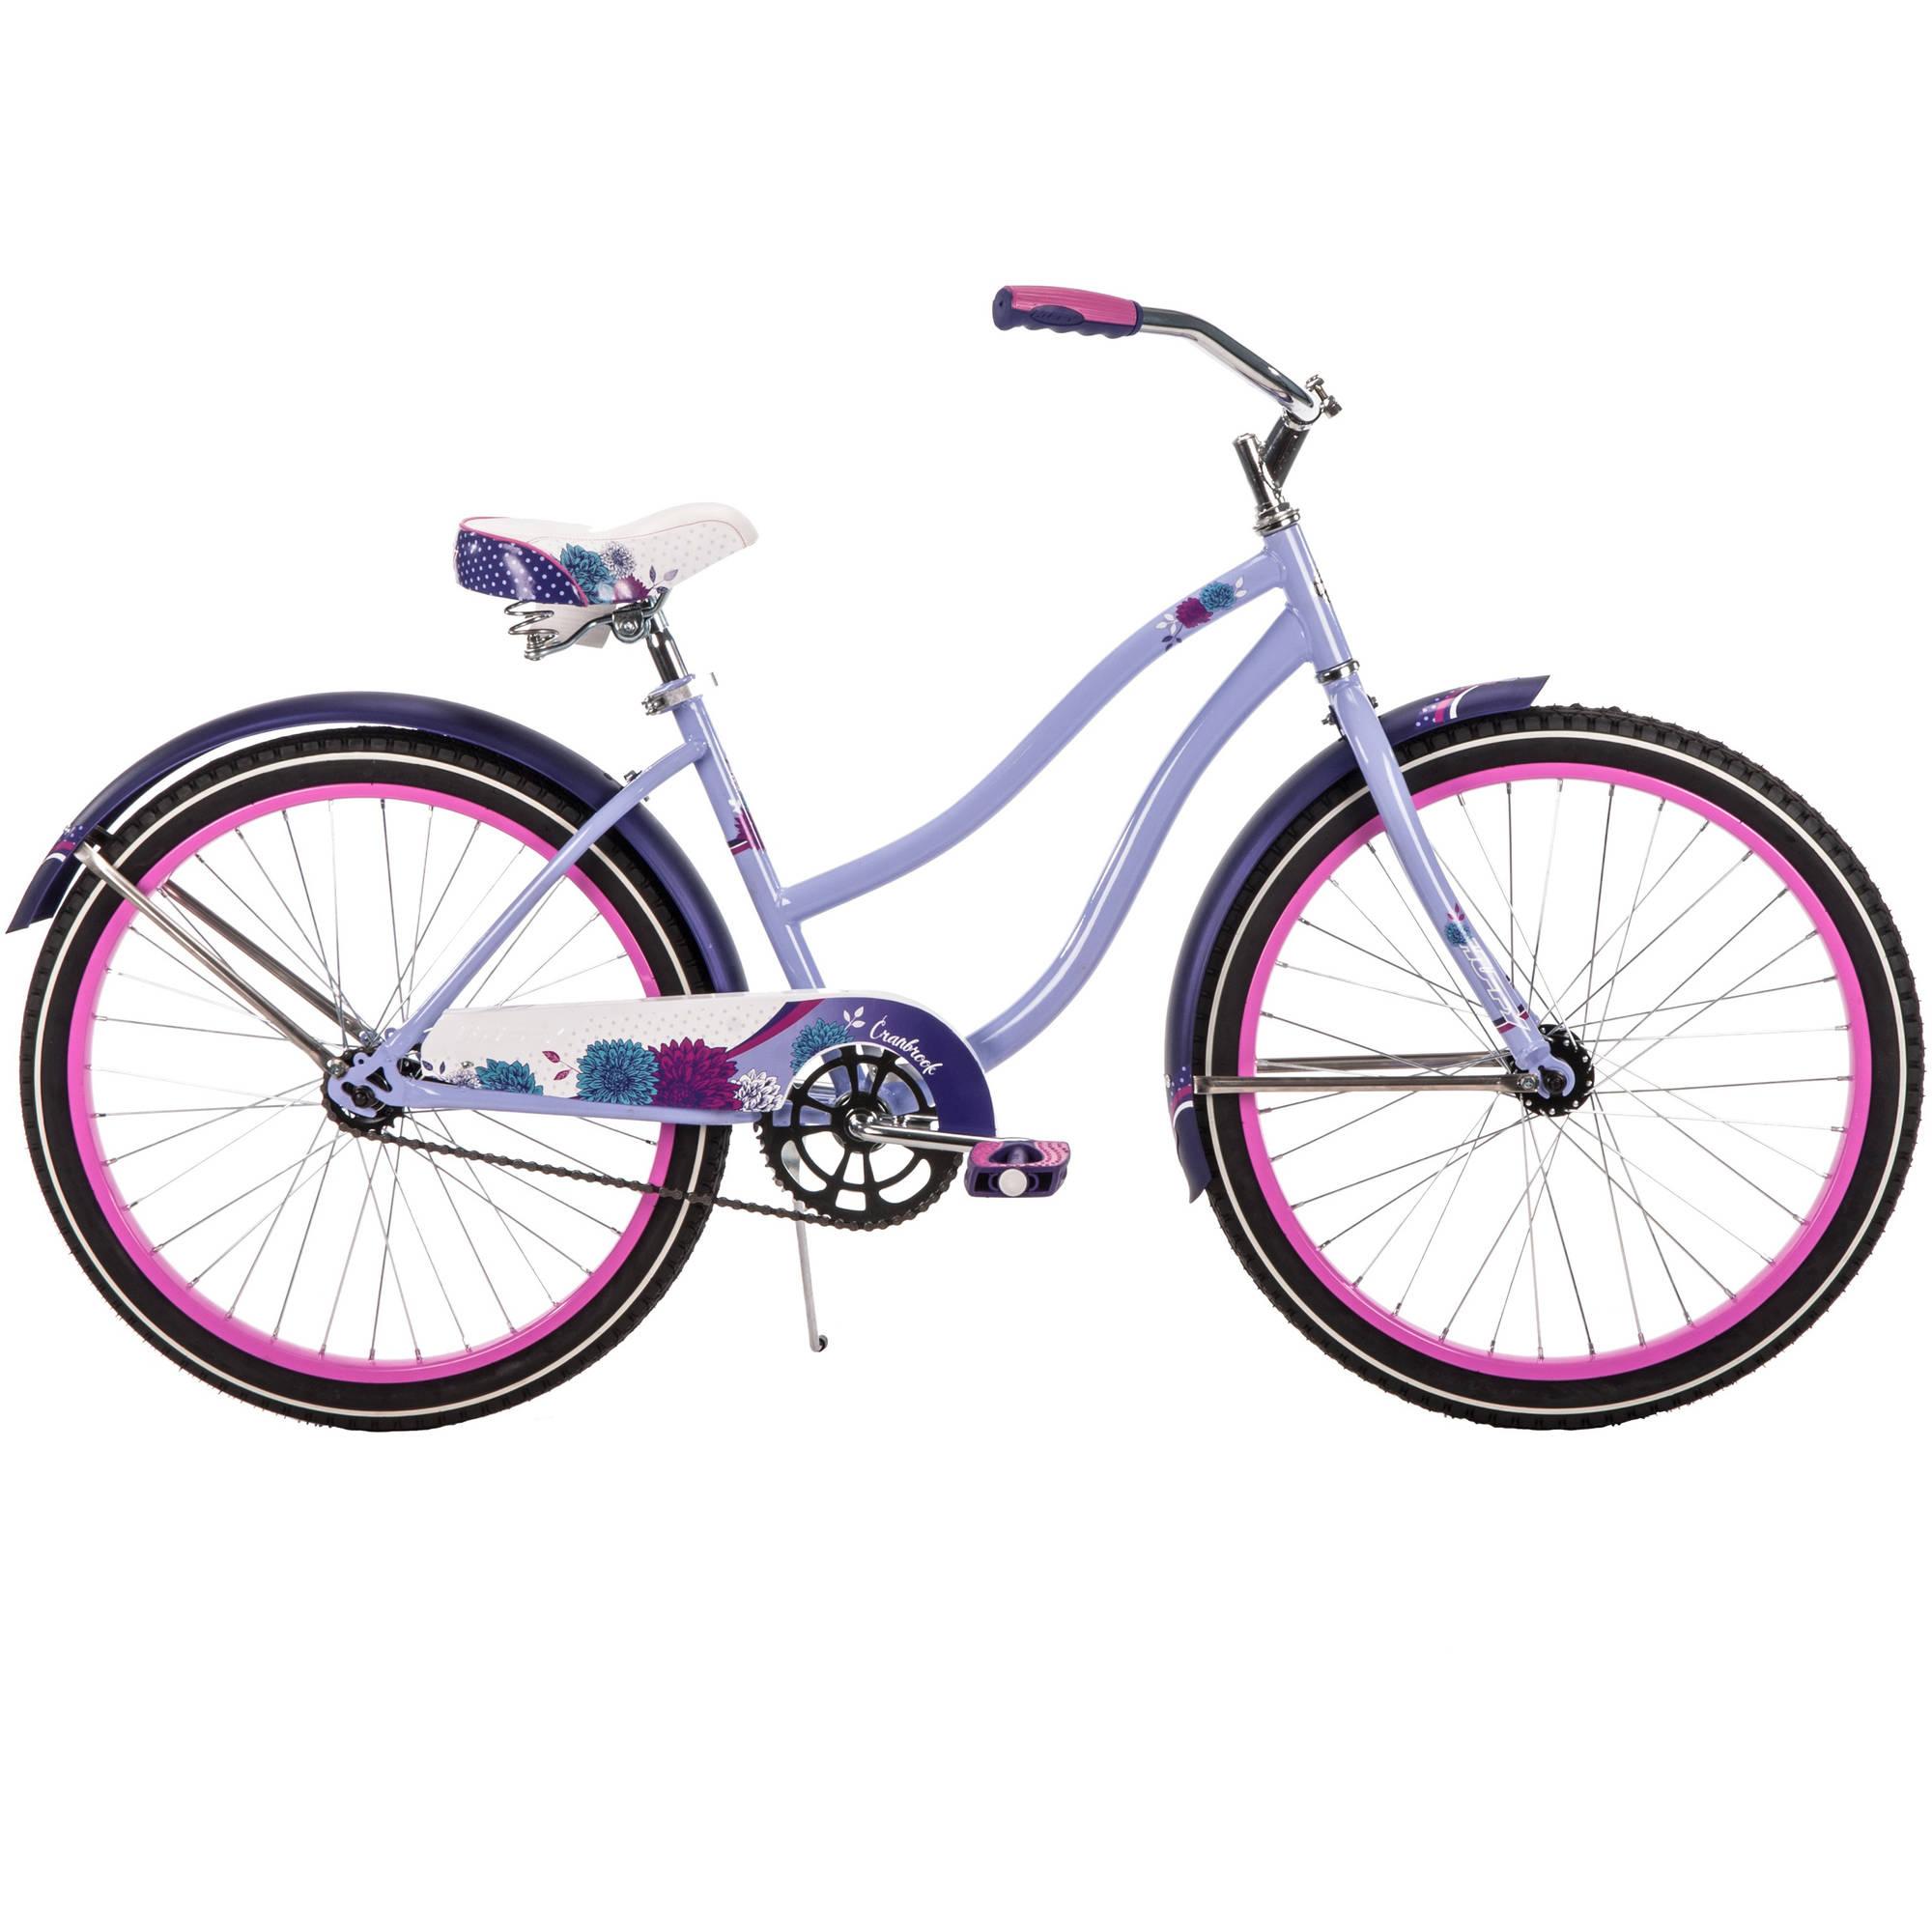 "Huffy 24"" Cranbrook Girls' Cruiser Bike, Lilac Purple"